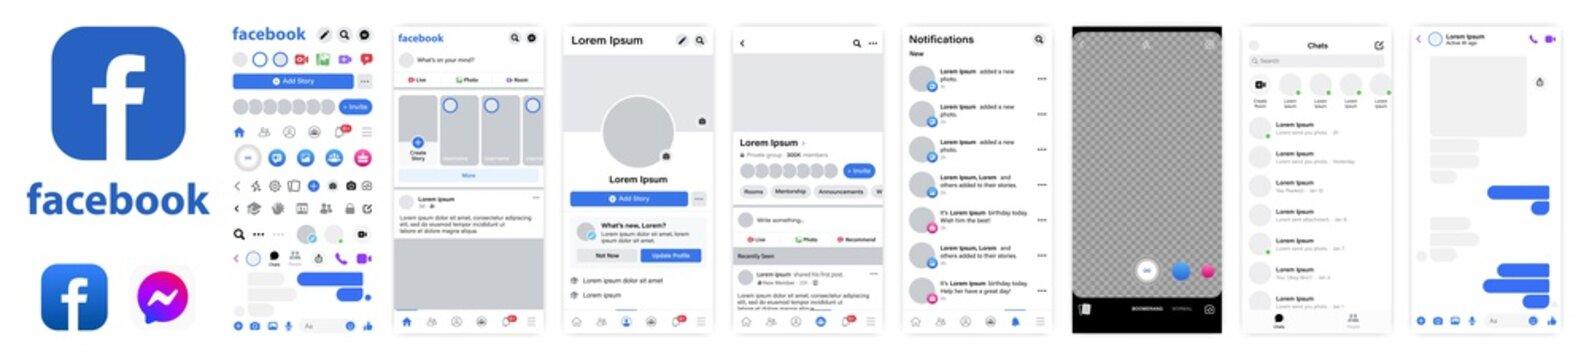 Facebook mockup. Set facebook screen social media and social network interface template. Facebook photo frame. Stories, liked, stream. Editorial vector. Vinnitsa, Ukraine - February 22, 2021